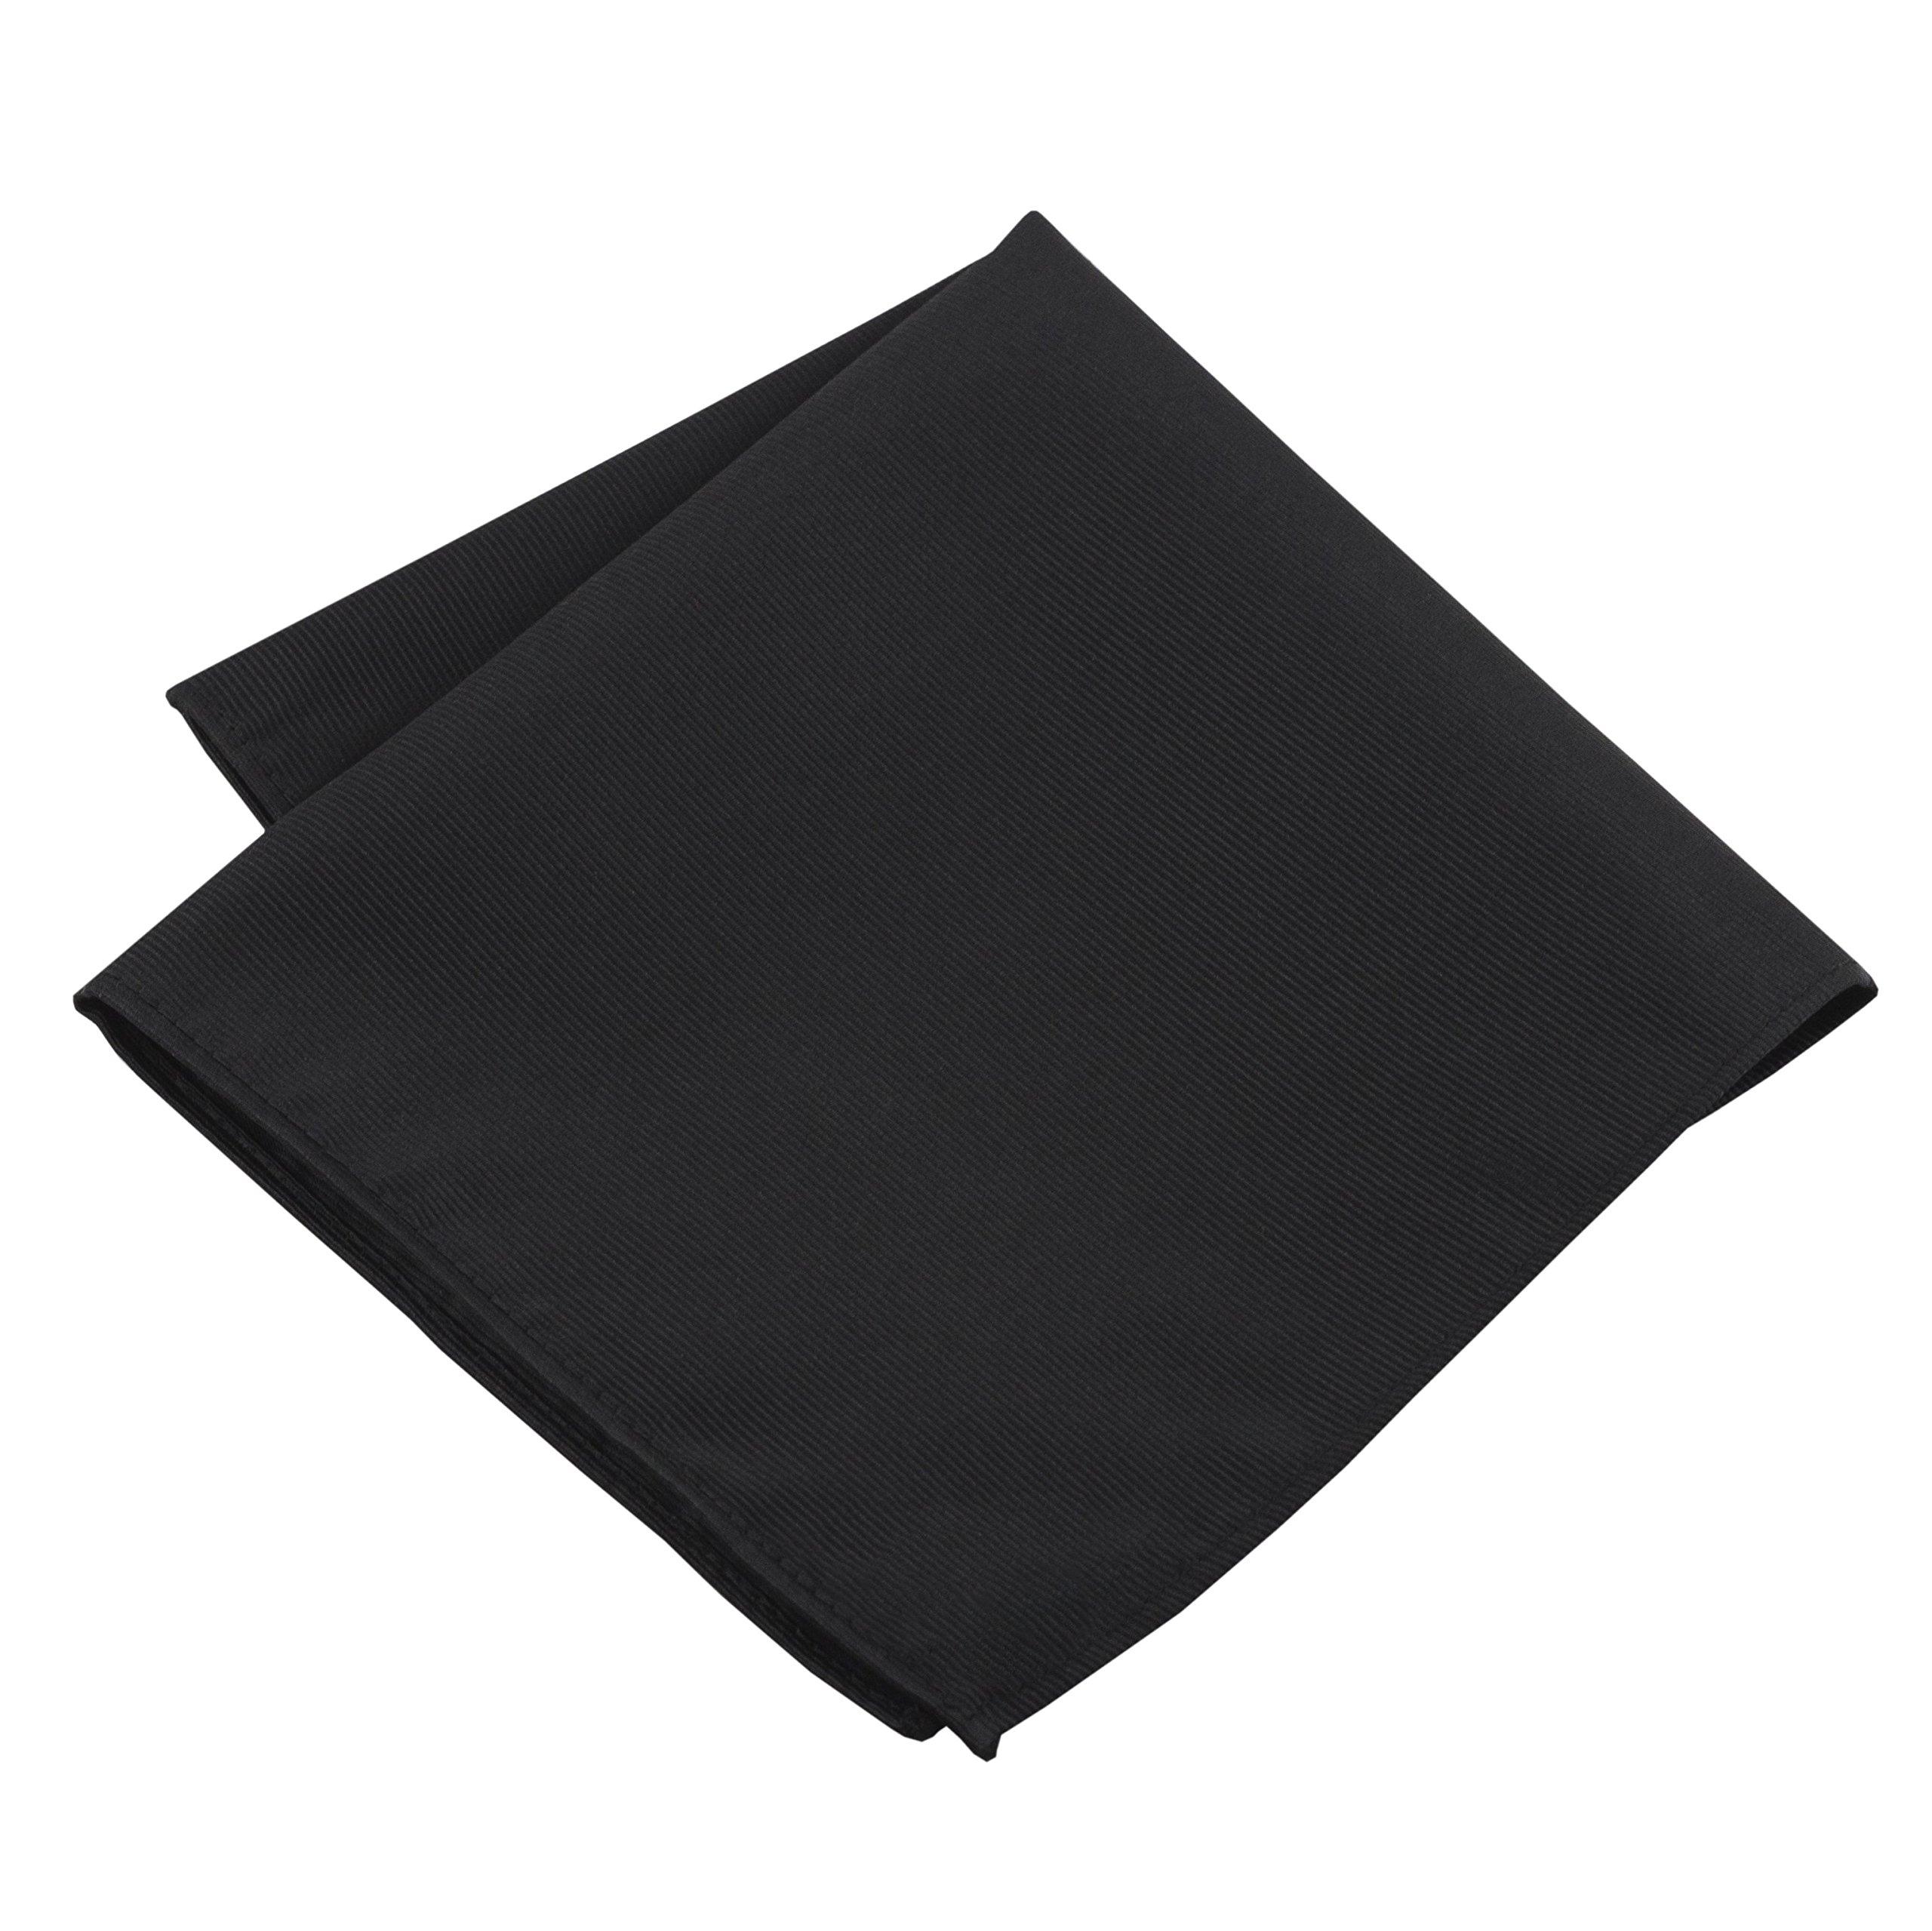 100% Silk Woven Black Pocket Square Handkerchief by John William by John William Clothing (Image #1)